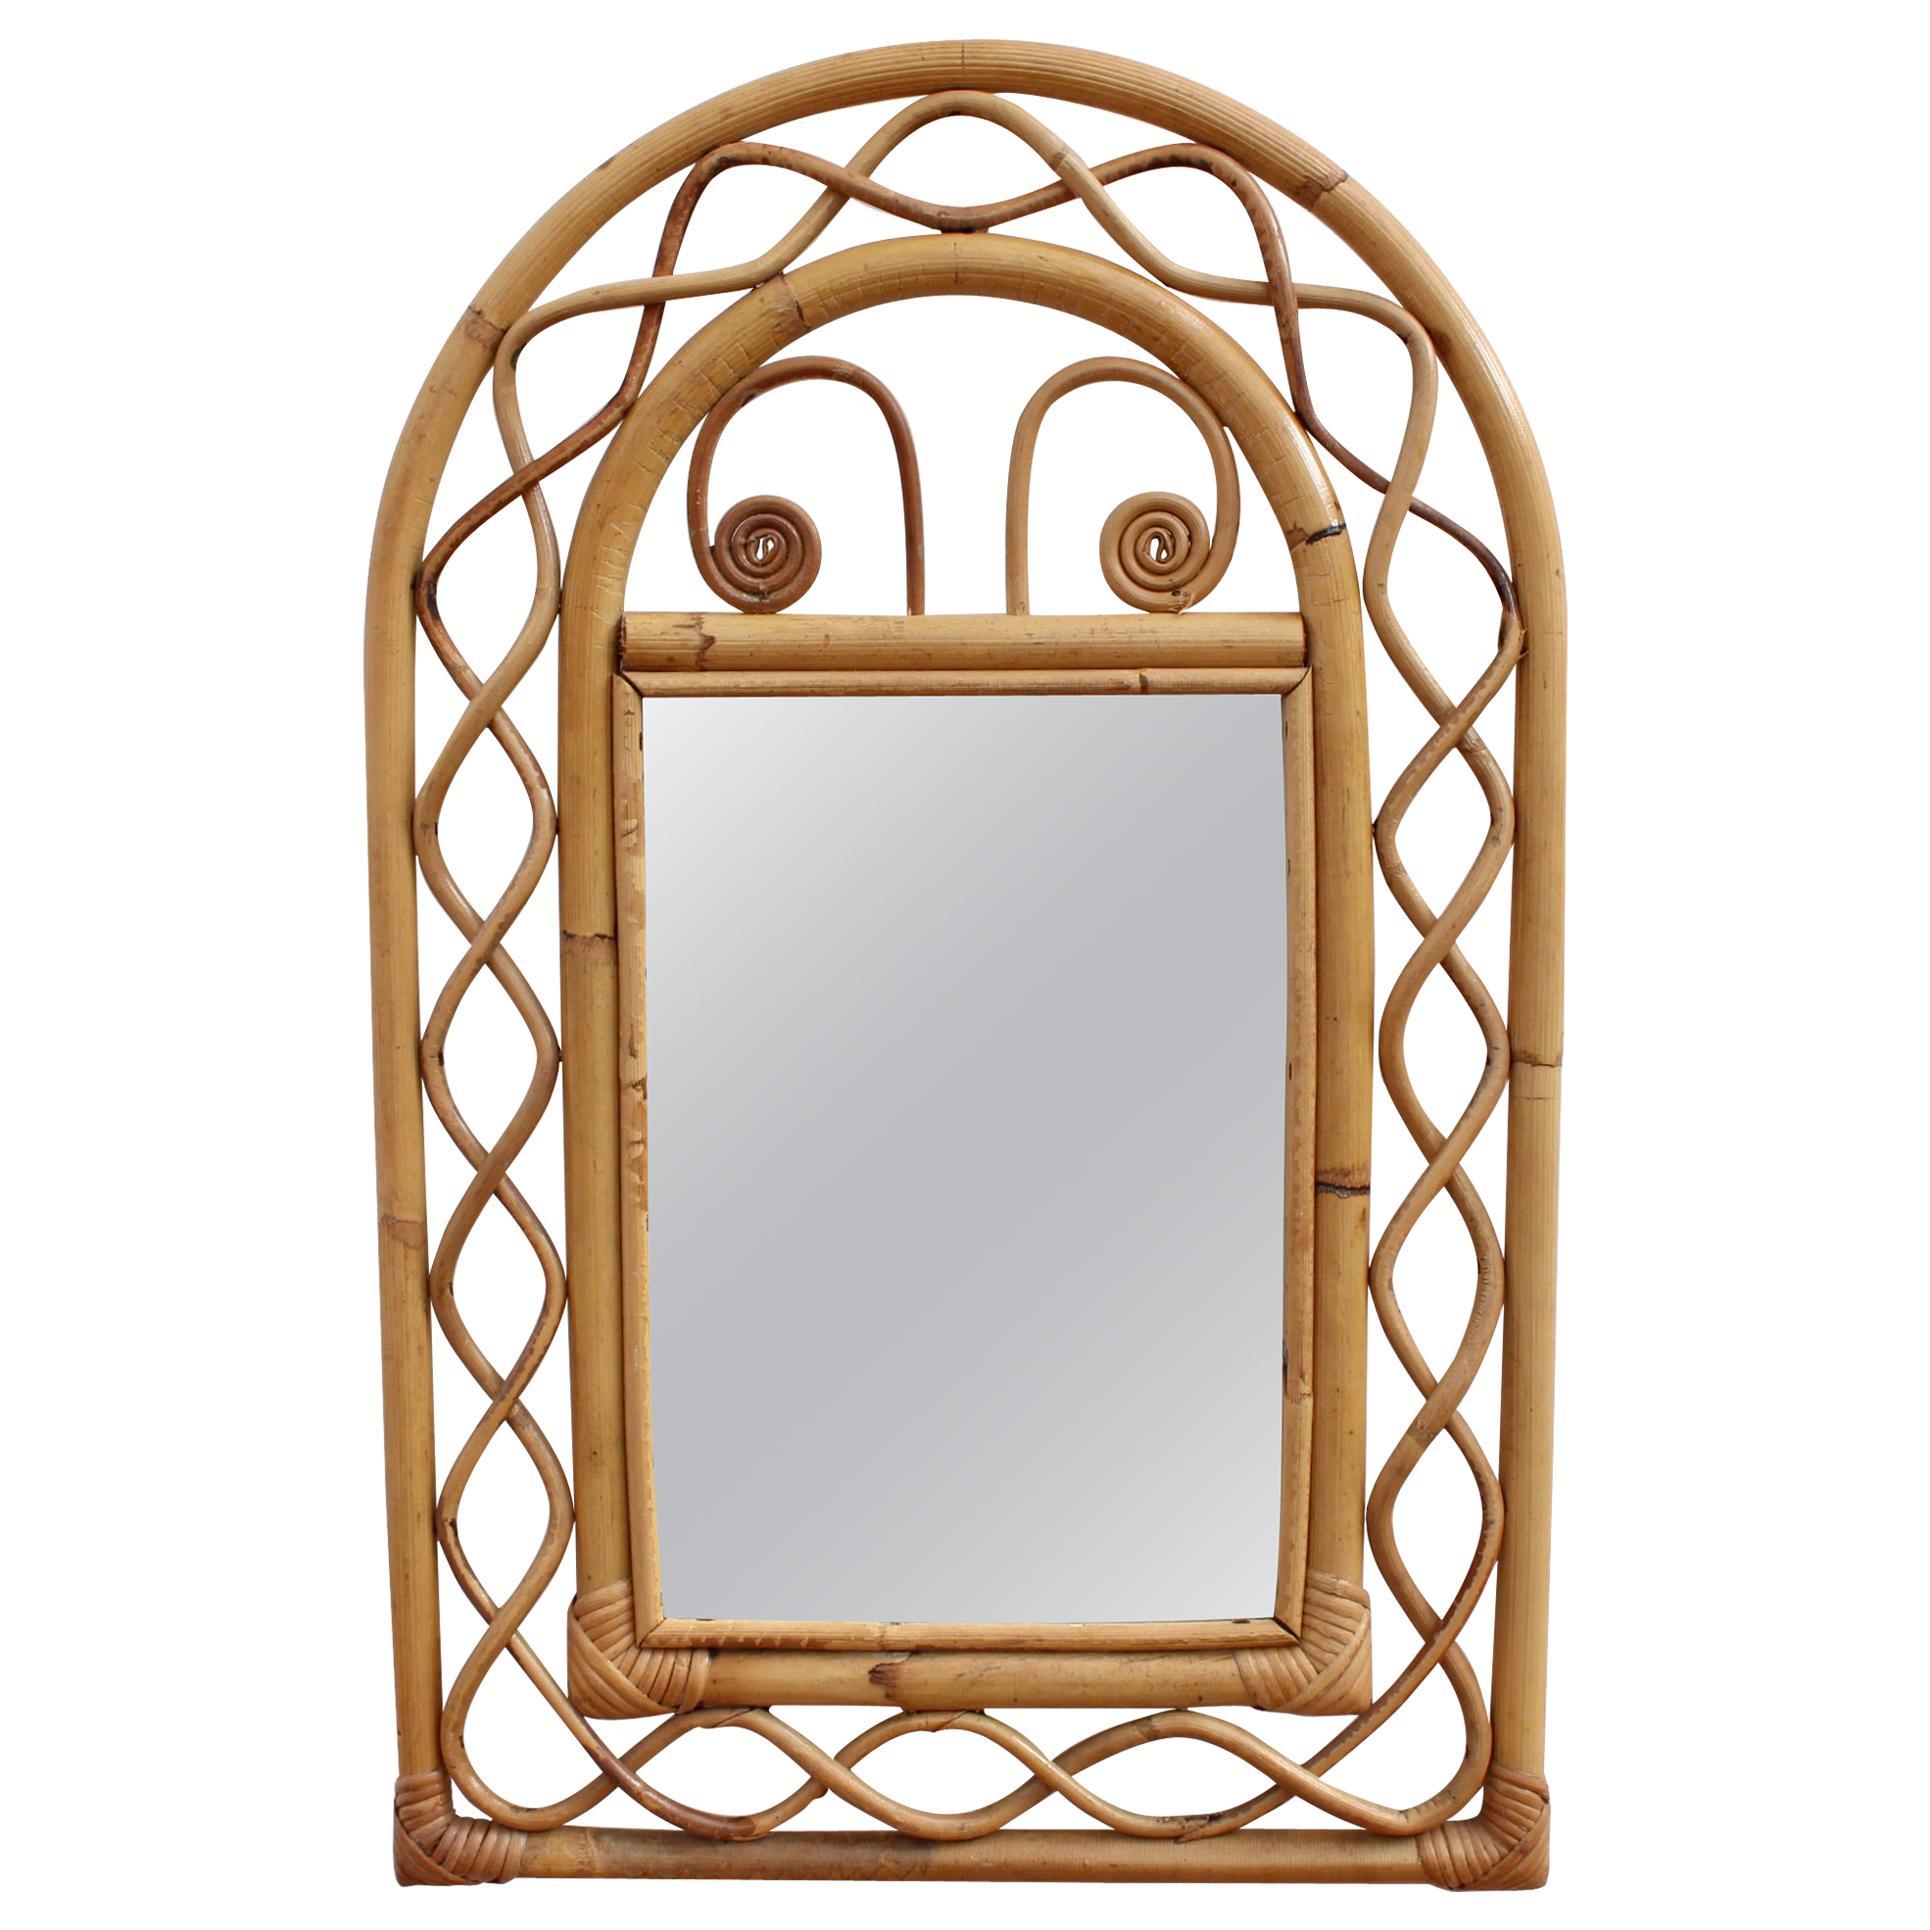 Vintage French Rattan Wall Mirror, 'circa 1960s'